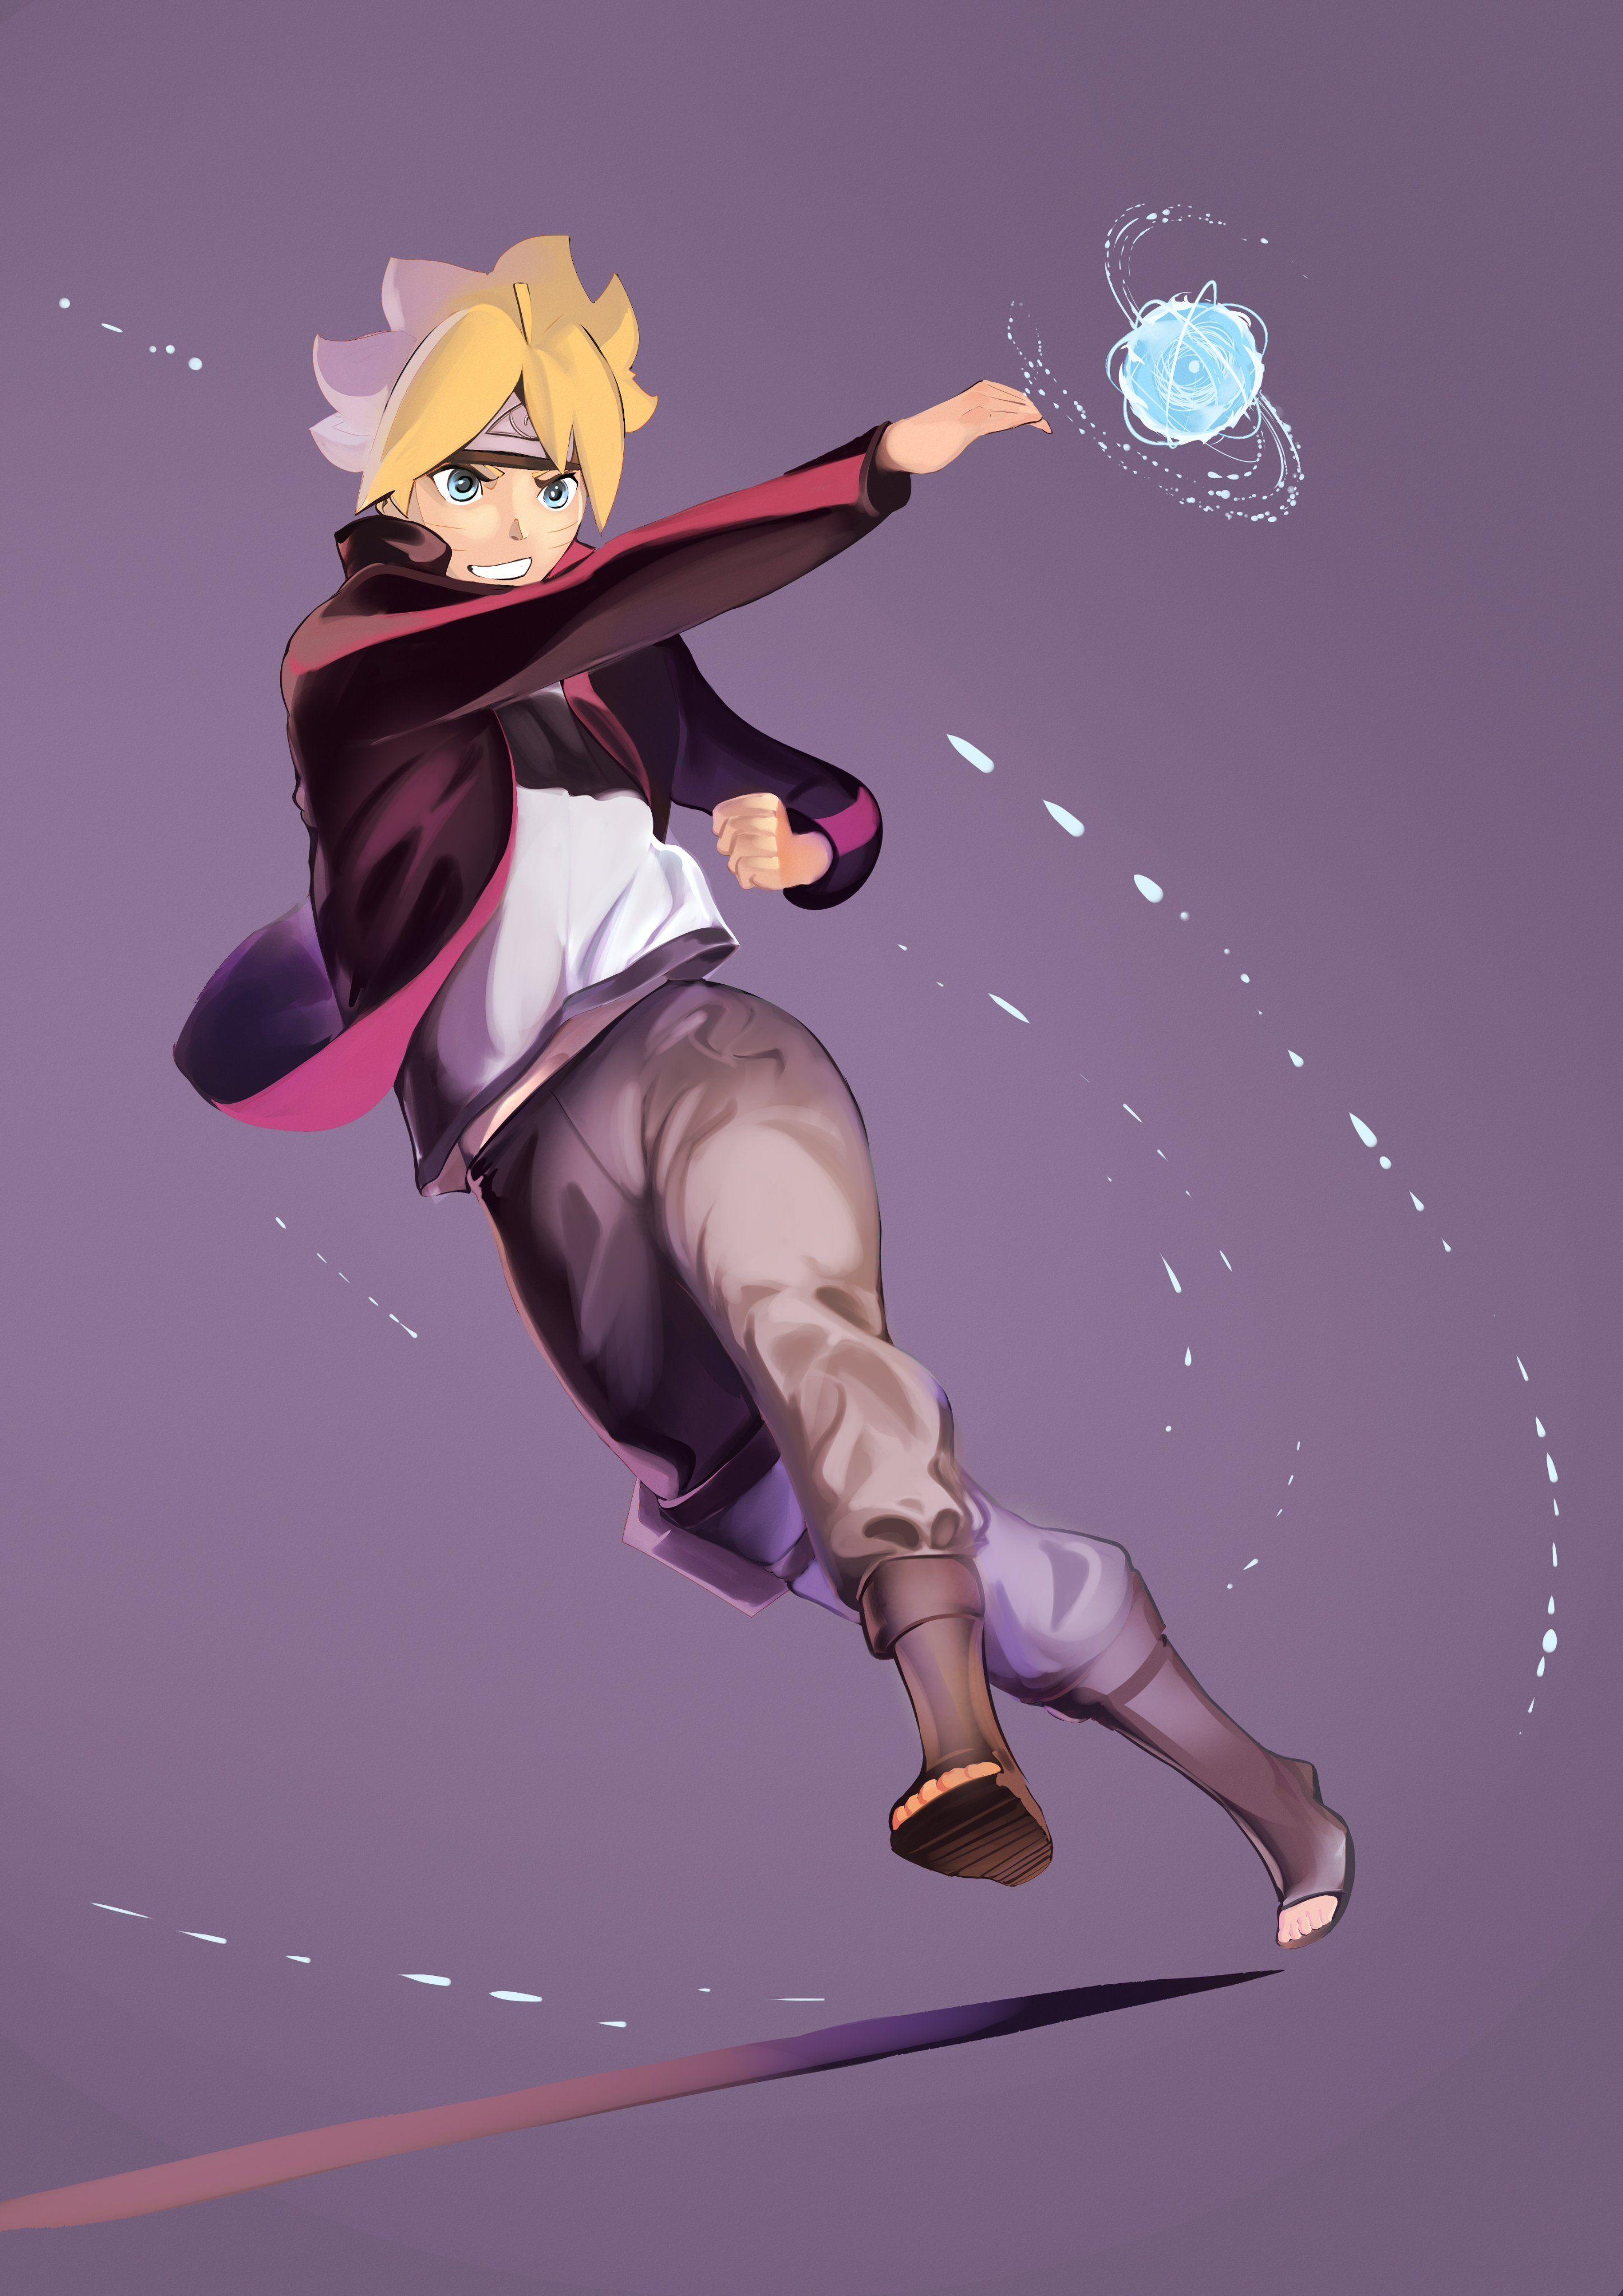 https://twitter.com/Megapuh/media in 2020 | Boruto, Naruto ...